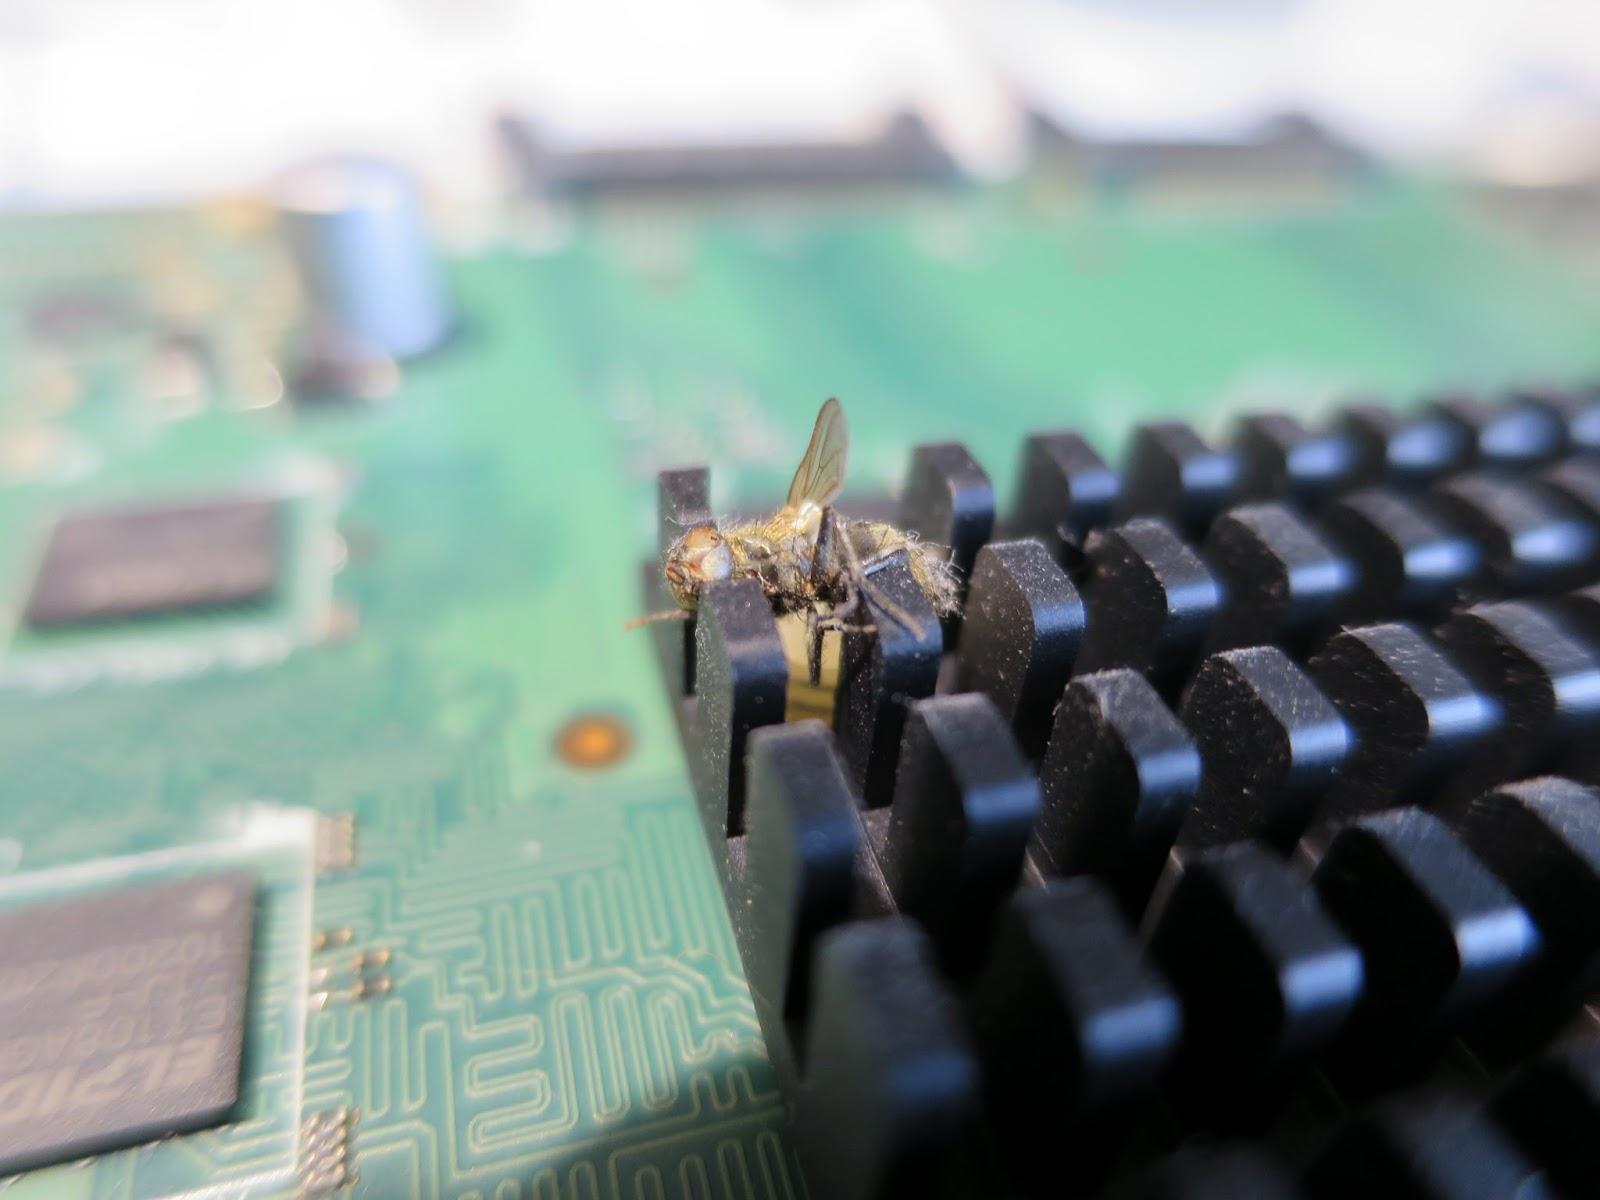 Alpengeist's TV (and other stuff) Repair Blog: Philips 42PFL7685